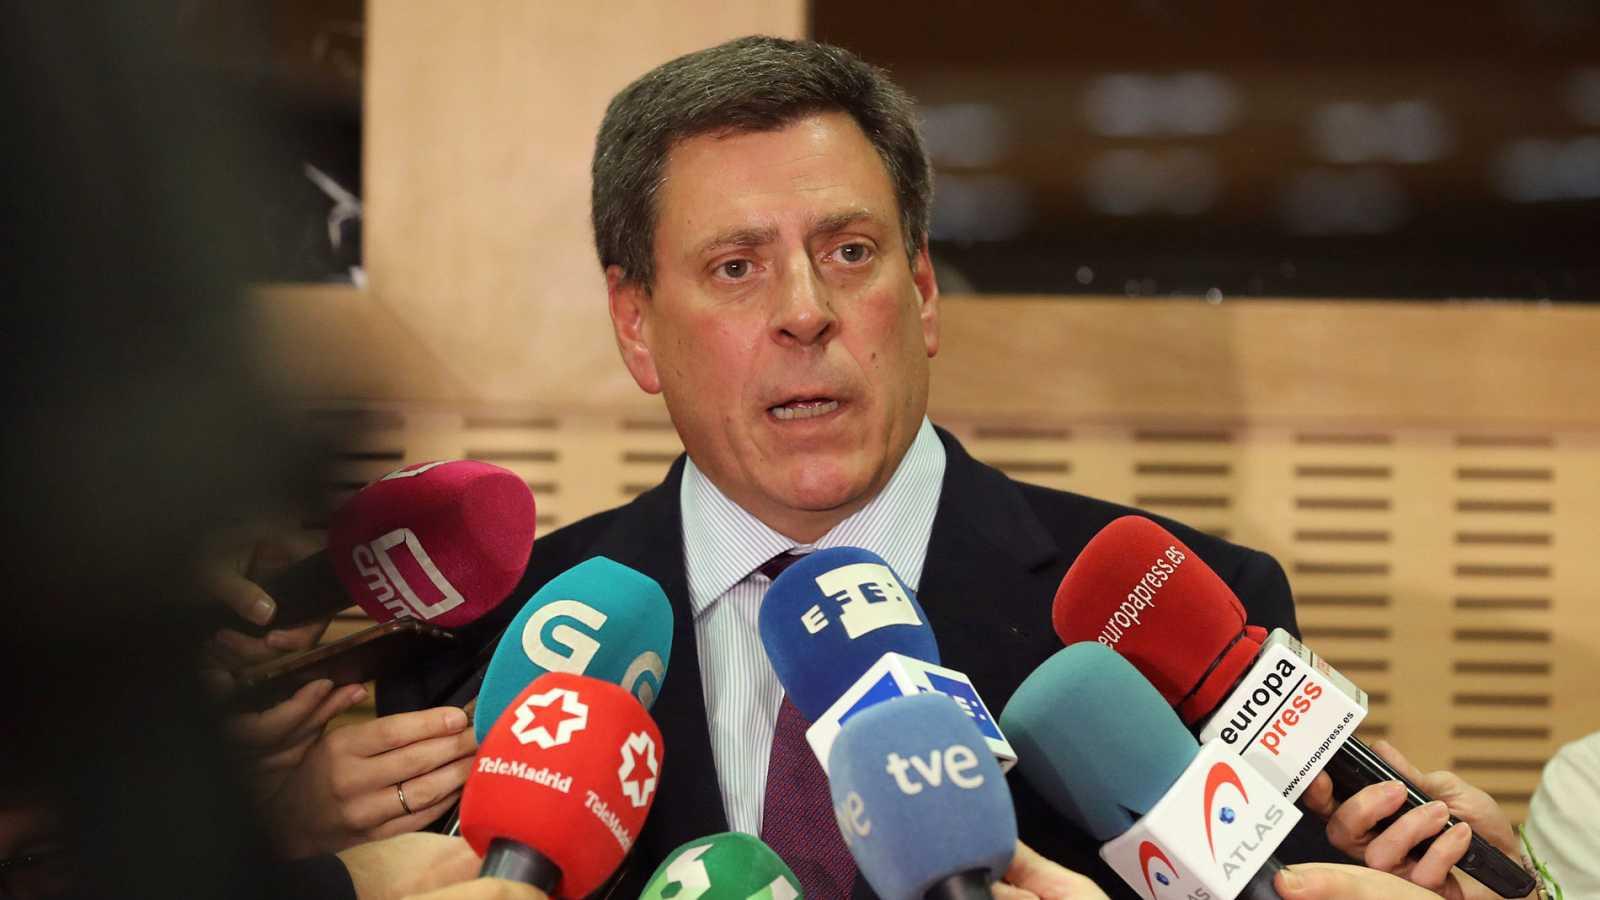 Juan Carlos Quer, padre de la joven madrileña Diana Quer que murió asesinada en agosto de 2016 en A Coruña